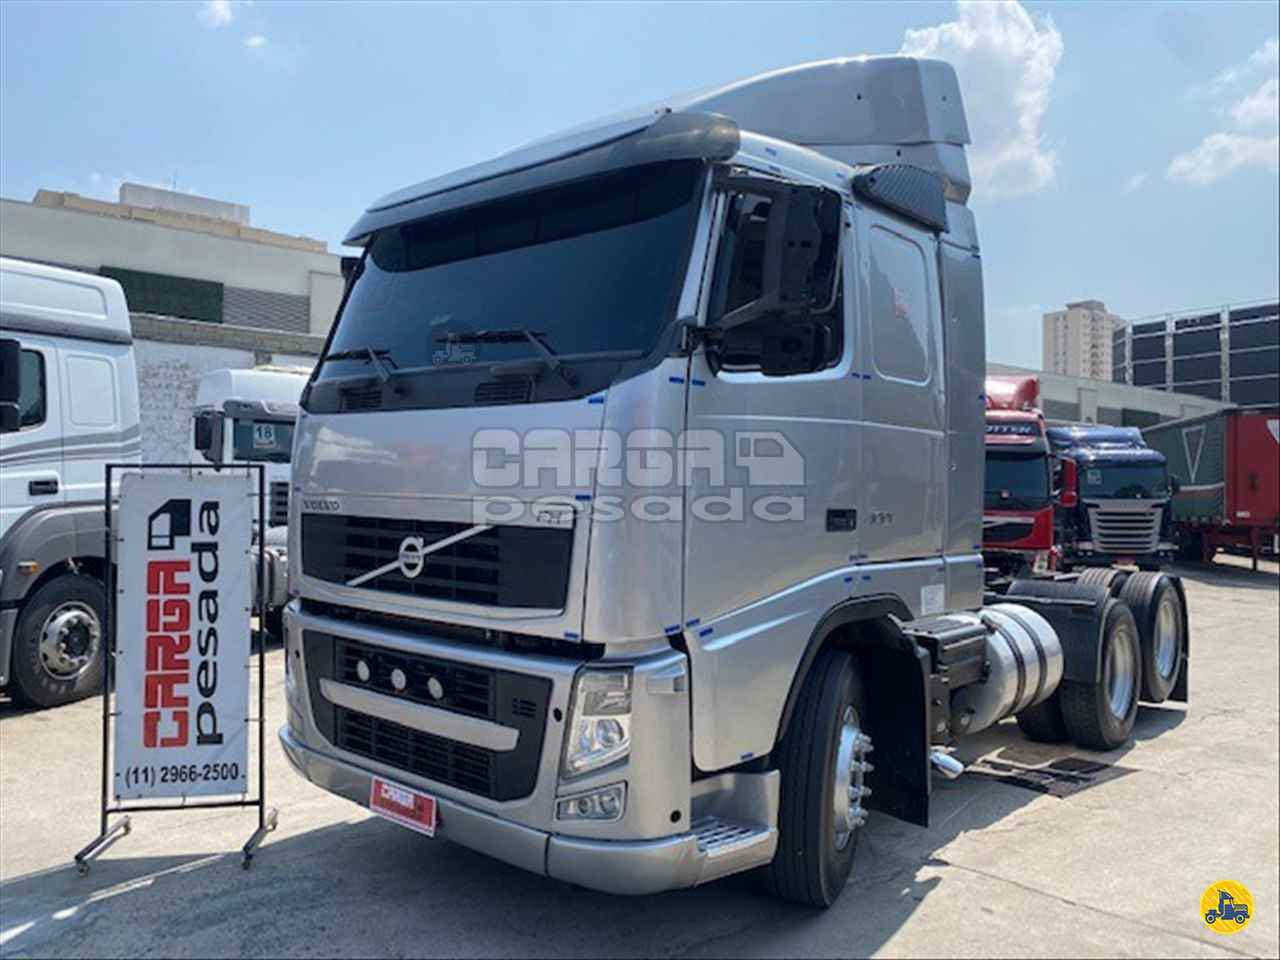 CAMINHAO VOLVO VOLVO FH 400 Cavalo Mecânico Truck 6x2 Carga Pesada Caminhões SAO PAULO SÃO PAULO SP